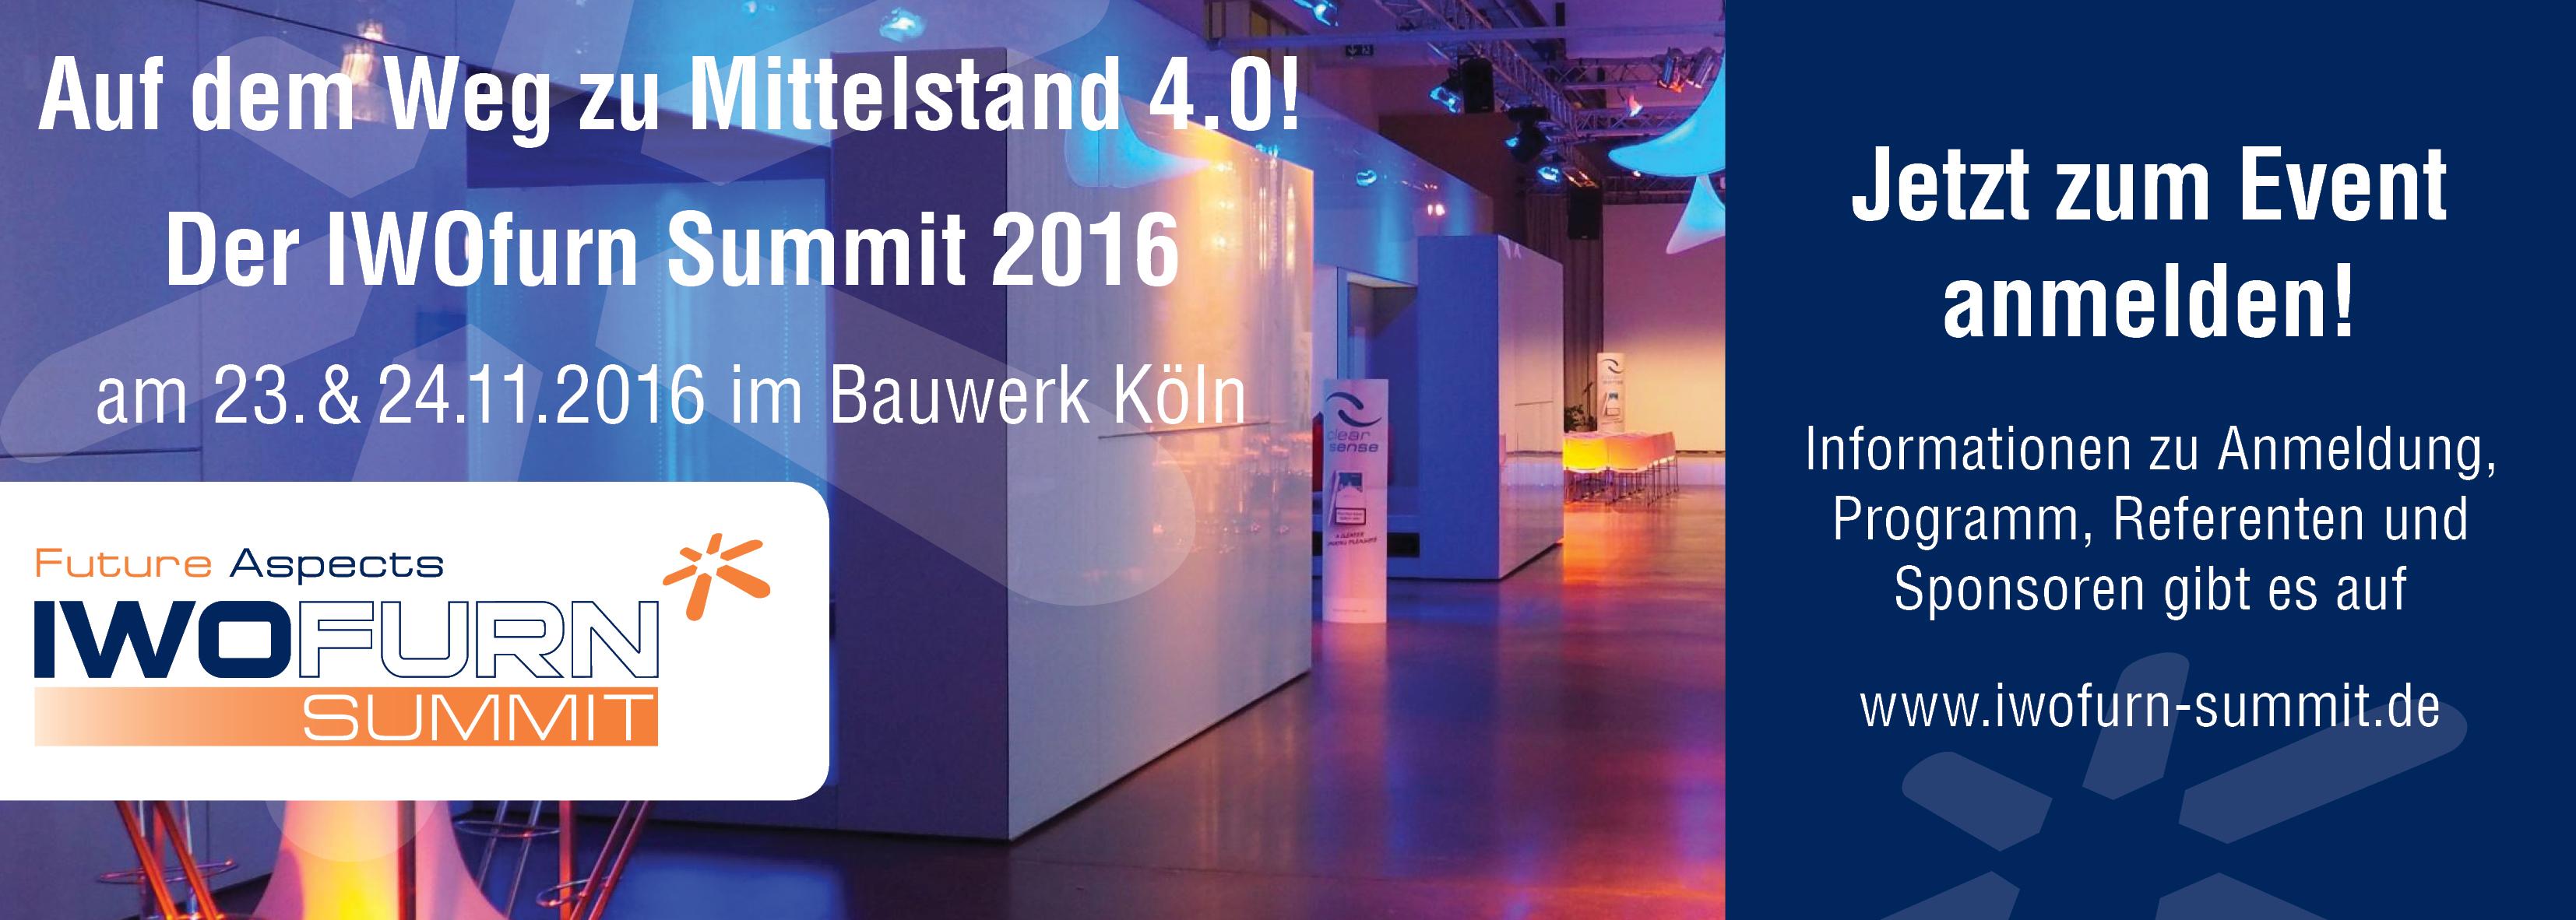 http://www.furnecorp.de/wp-content/uploads/2016/03/IWOfurn_Summit_Halfsize_Banner.jpg